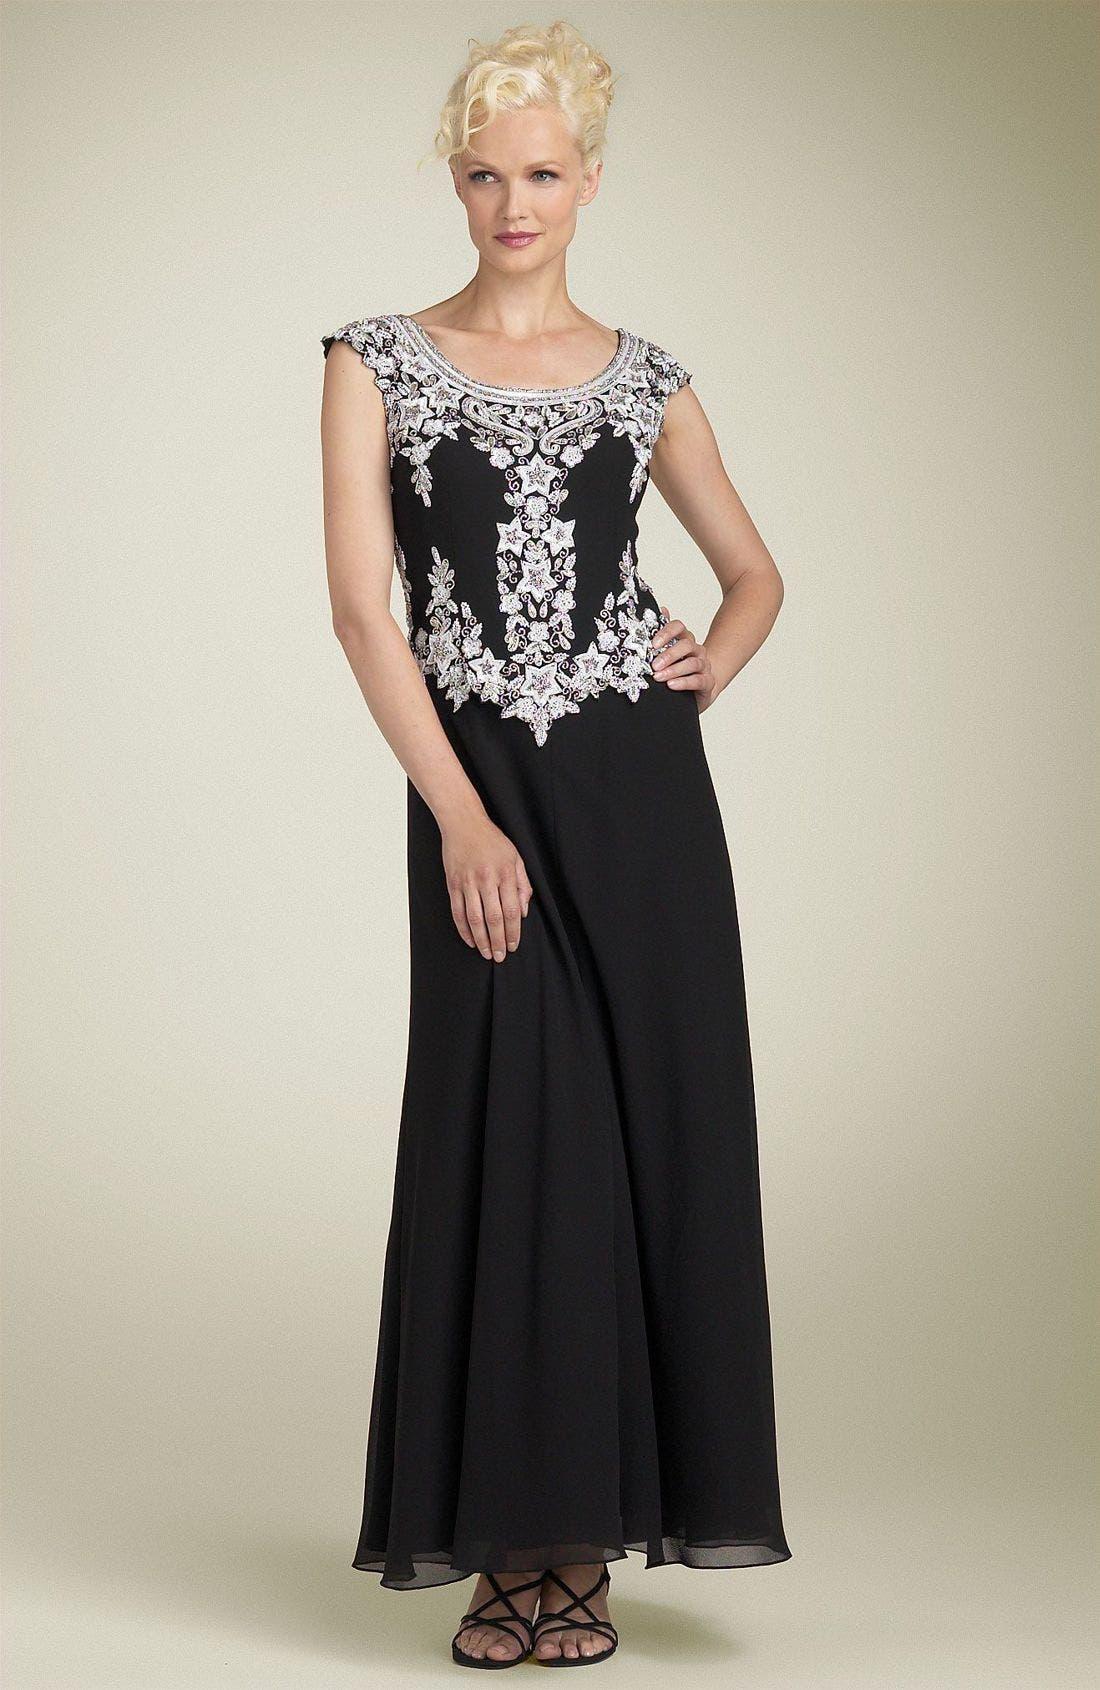 Main Image - J Kara Mock Two Piece Scalloped Dress